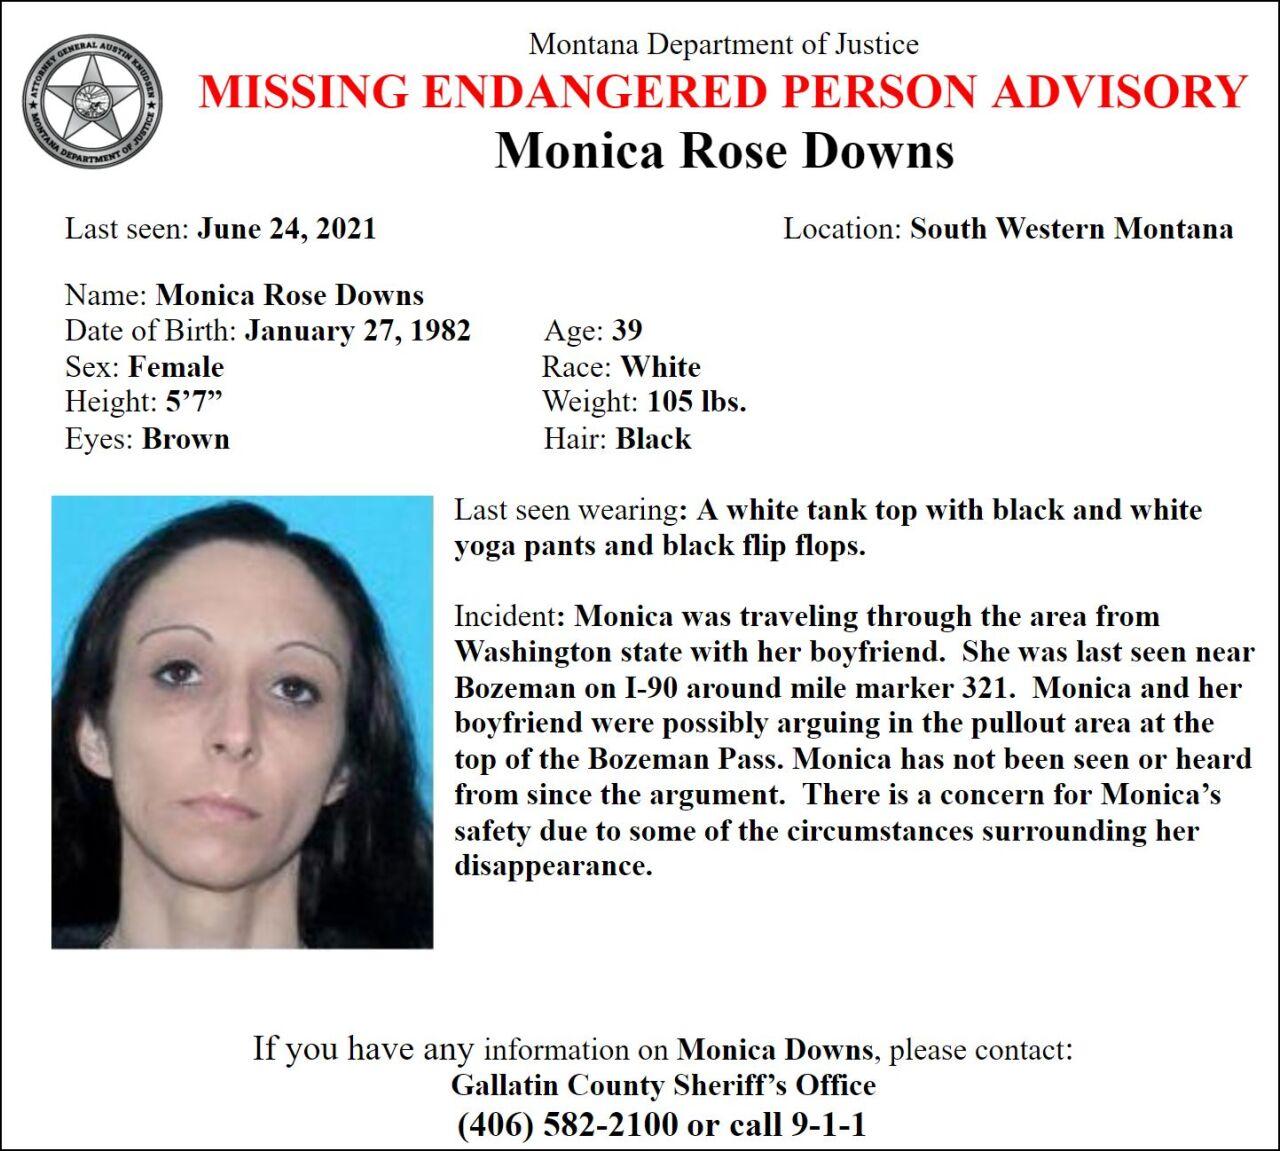 Missing-Endangered Person Advisory for Monica Rose Downs